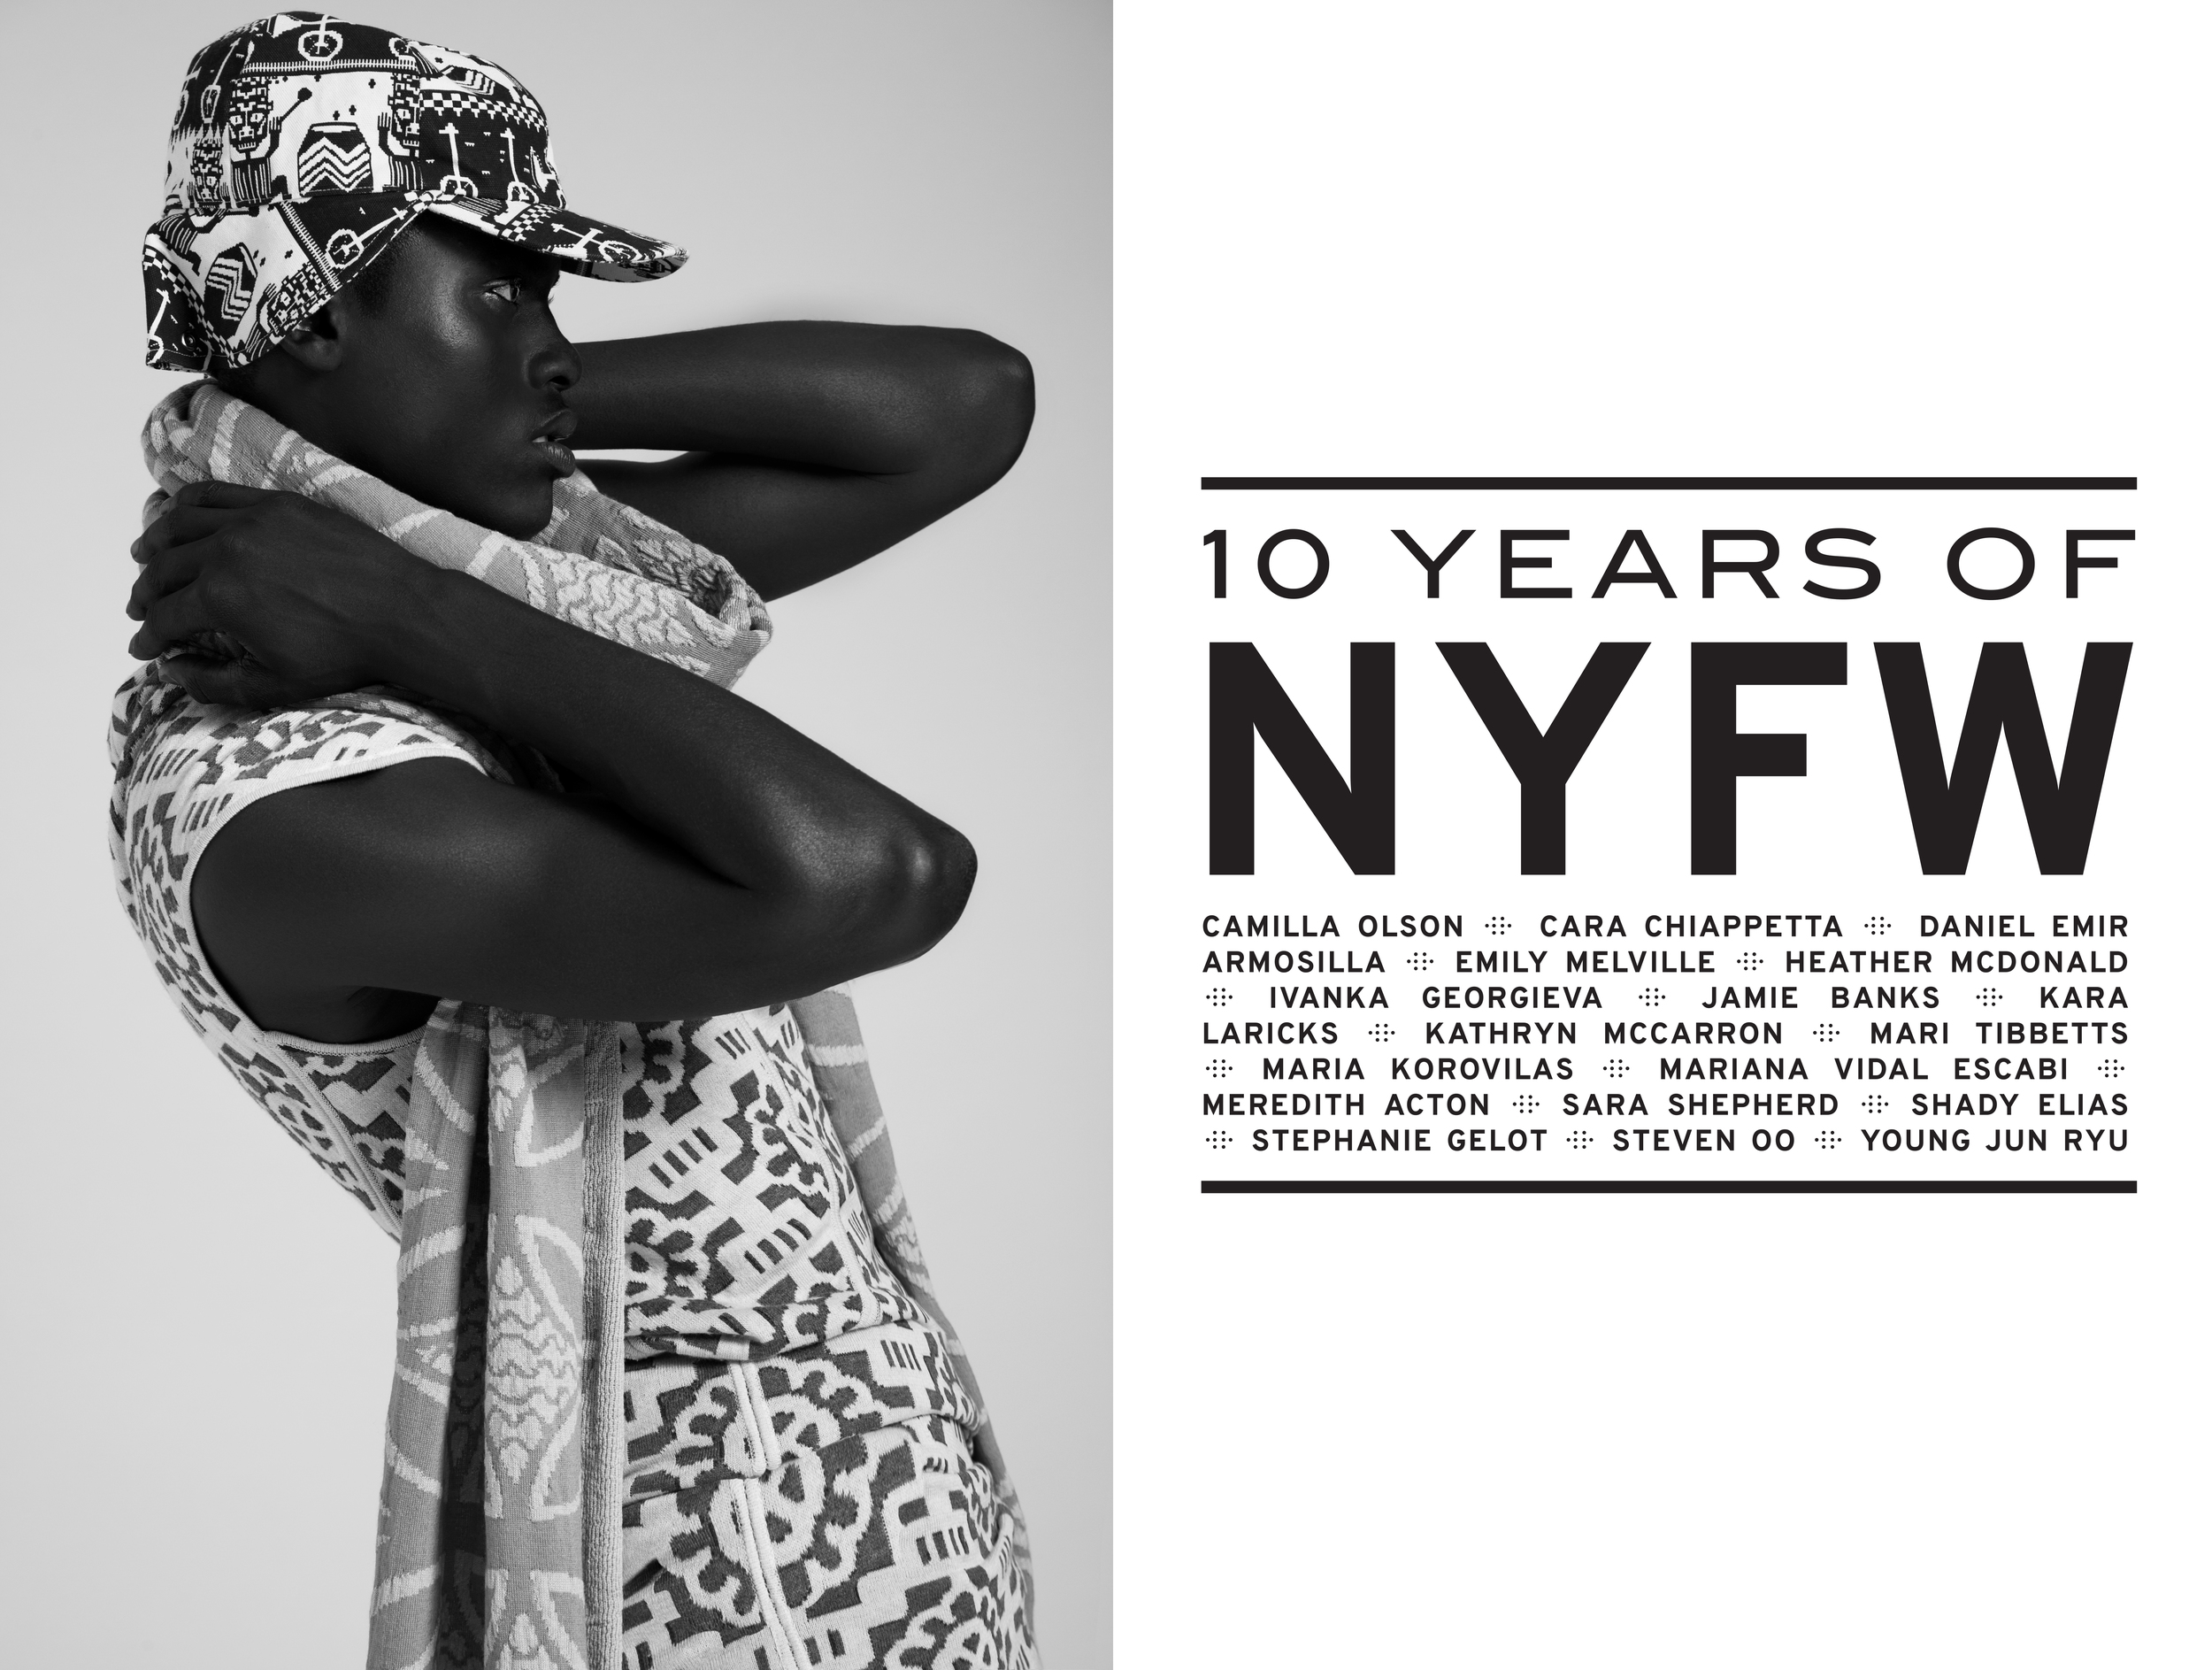 Jacquard Knit Tunic and Skirt by Stephanie Gelot, MFA Knitwear Design, 2011.